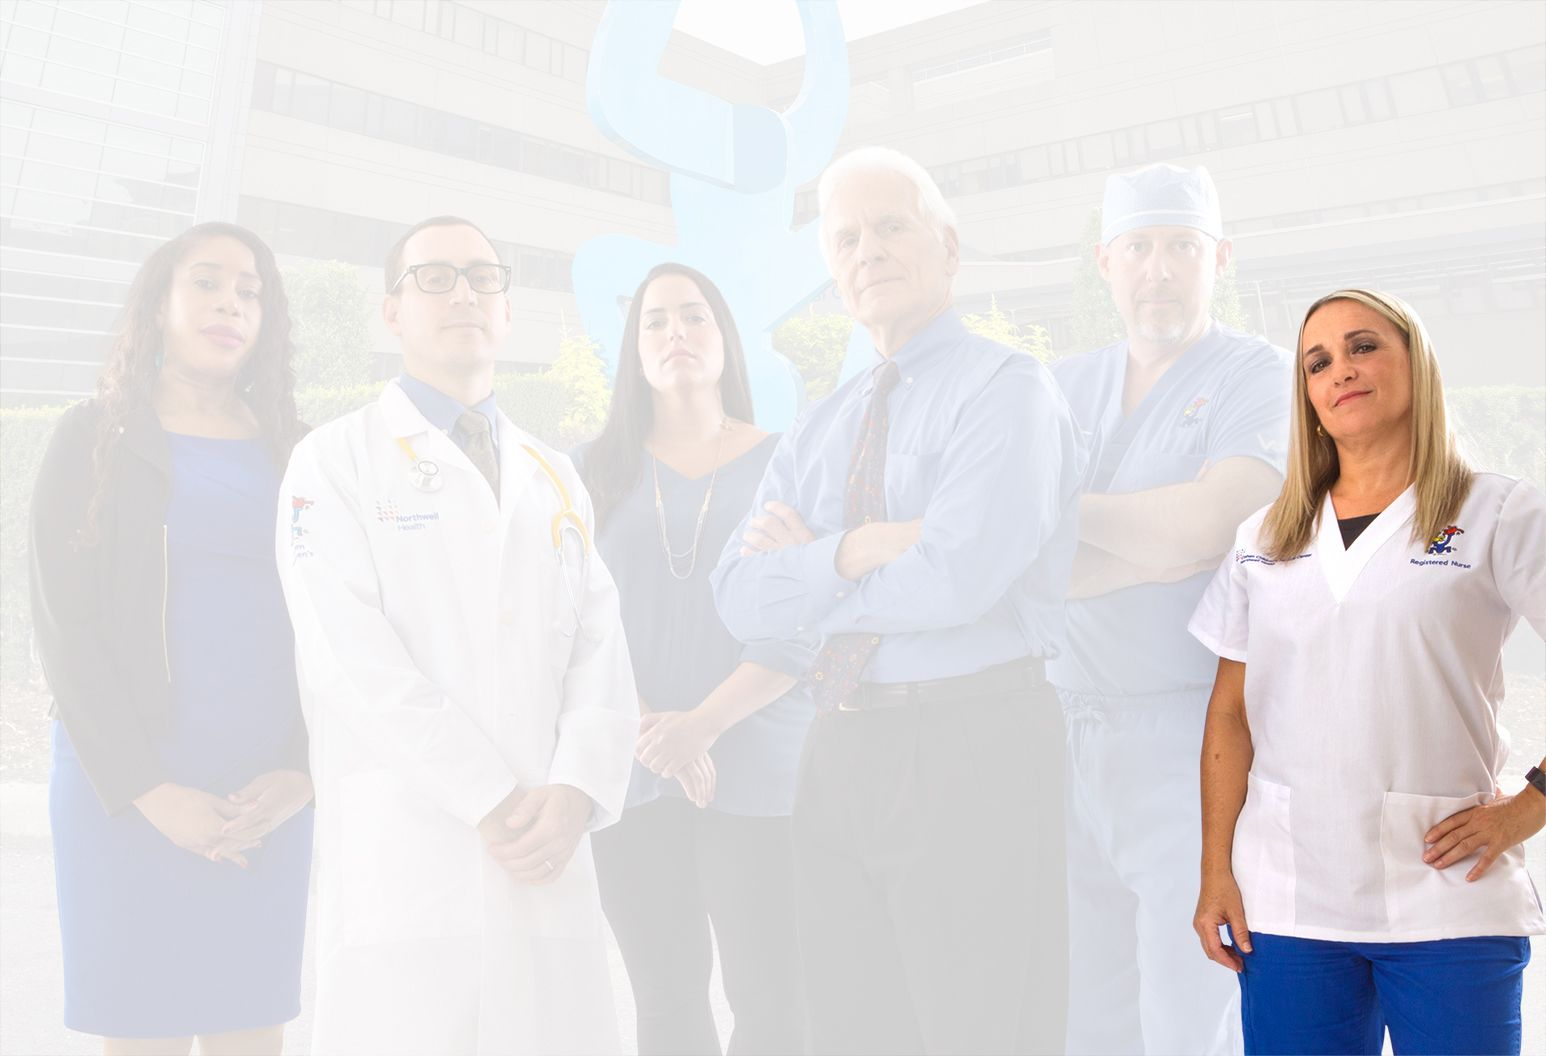 Pediatric Hematology, Oncology & Stem Cell Transplantation